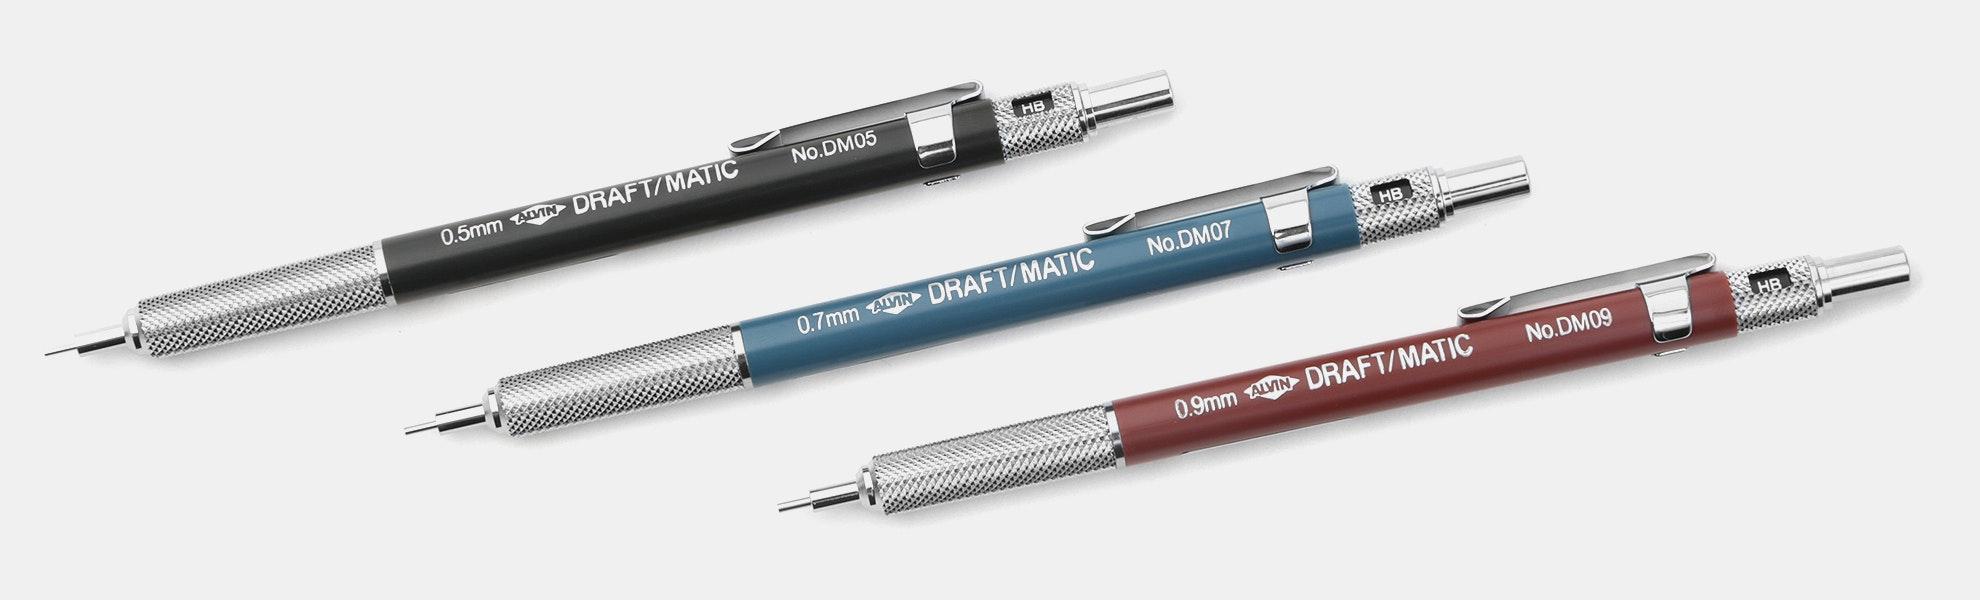 Alvin Draft-Matic Mechanical Pencil Set